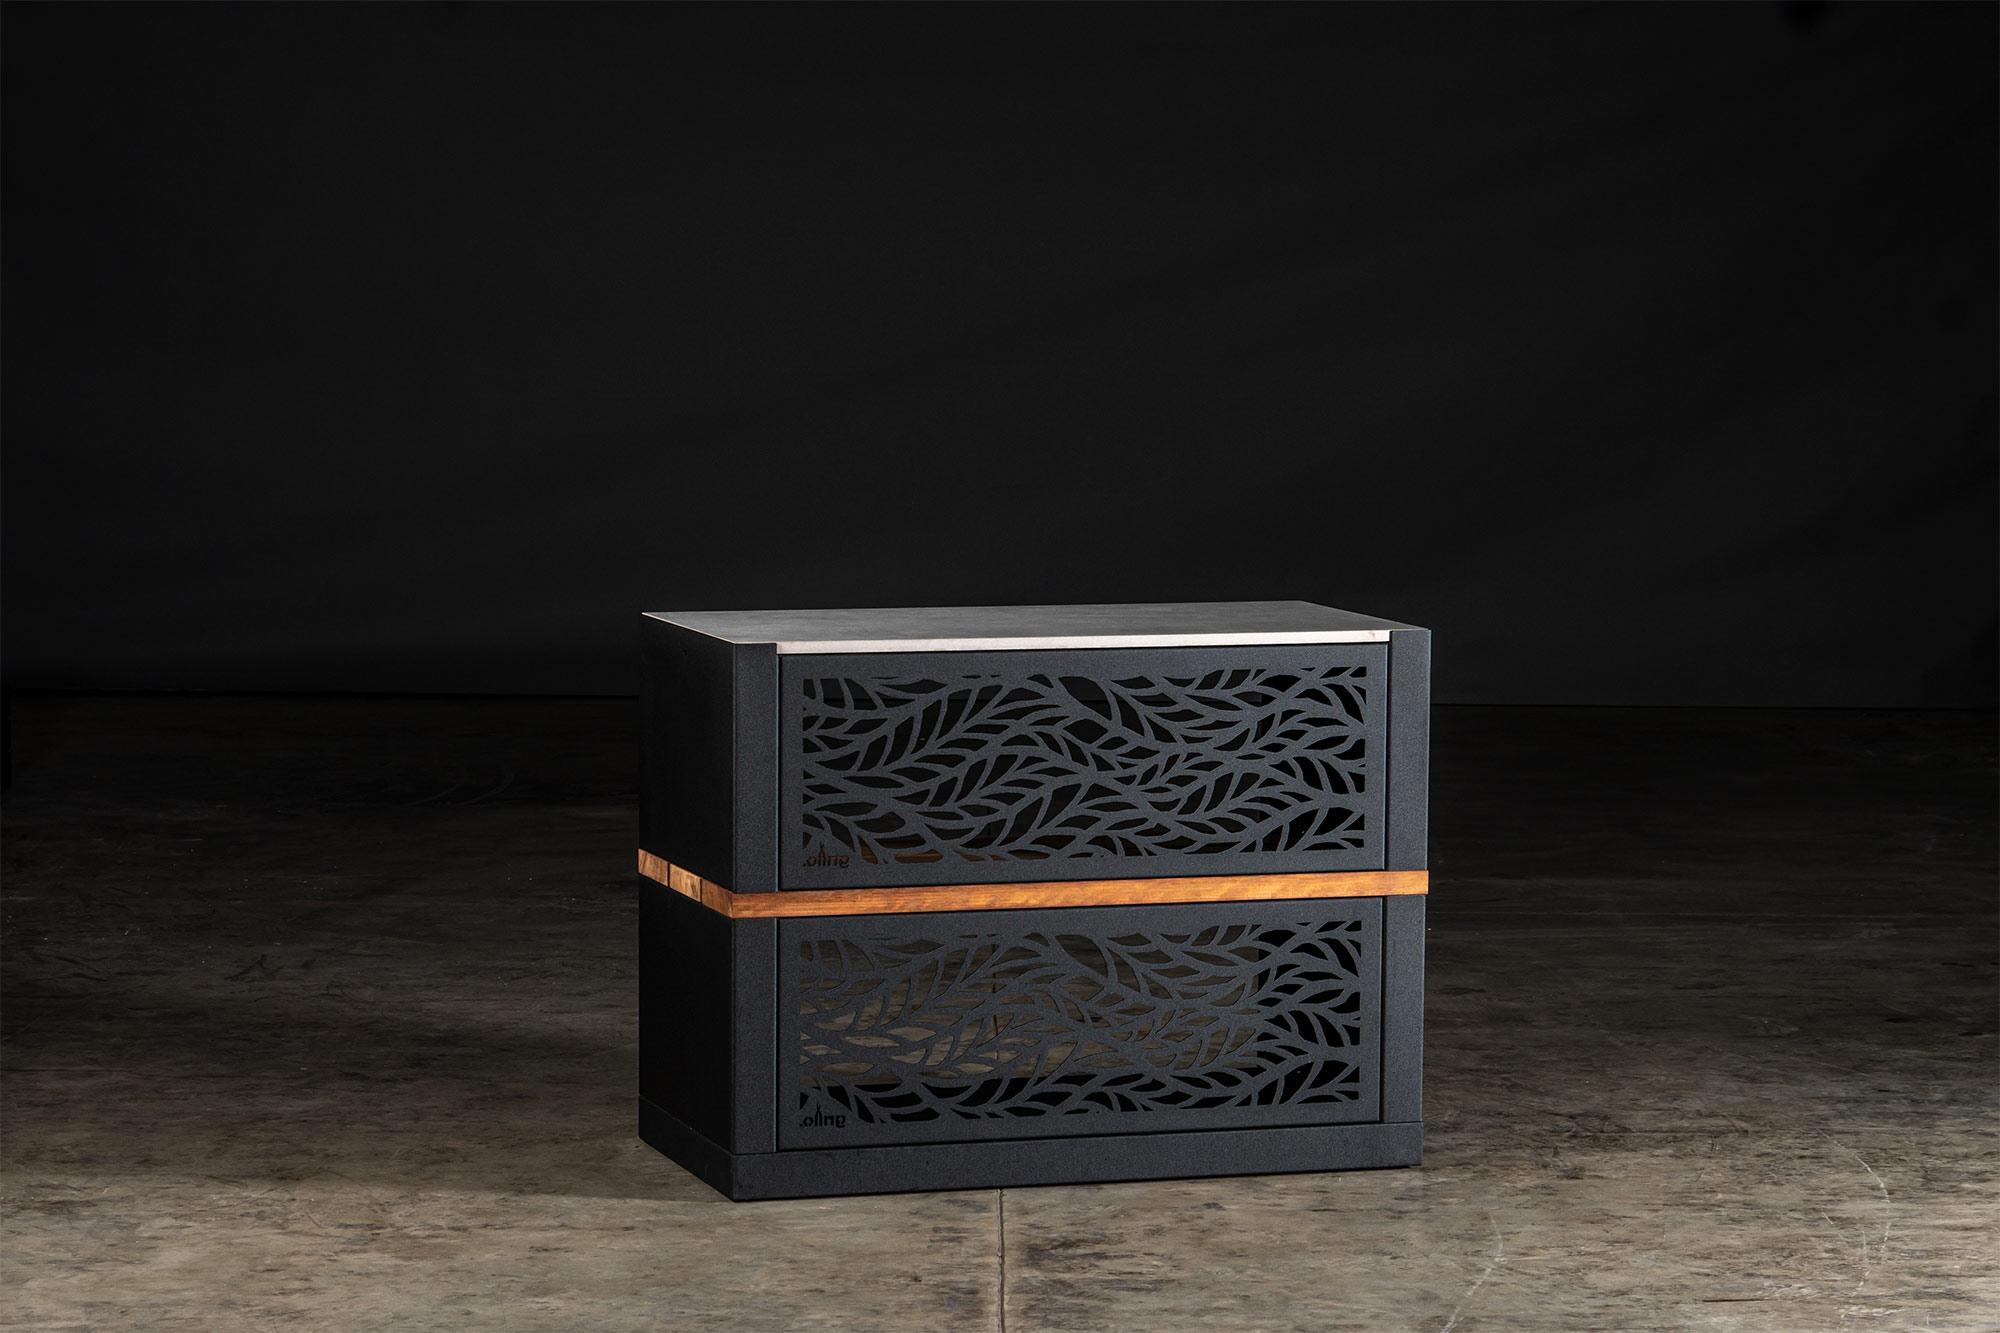 black carbon steel vantage Kitchen Cabinet Back View with black Habitat Rear Fascia and grey porcelain worktops